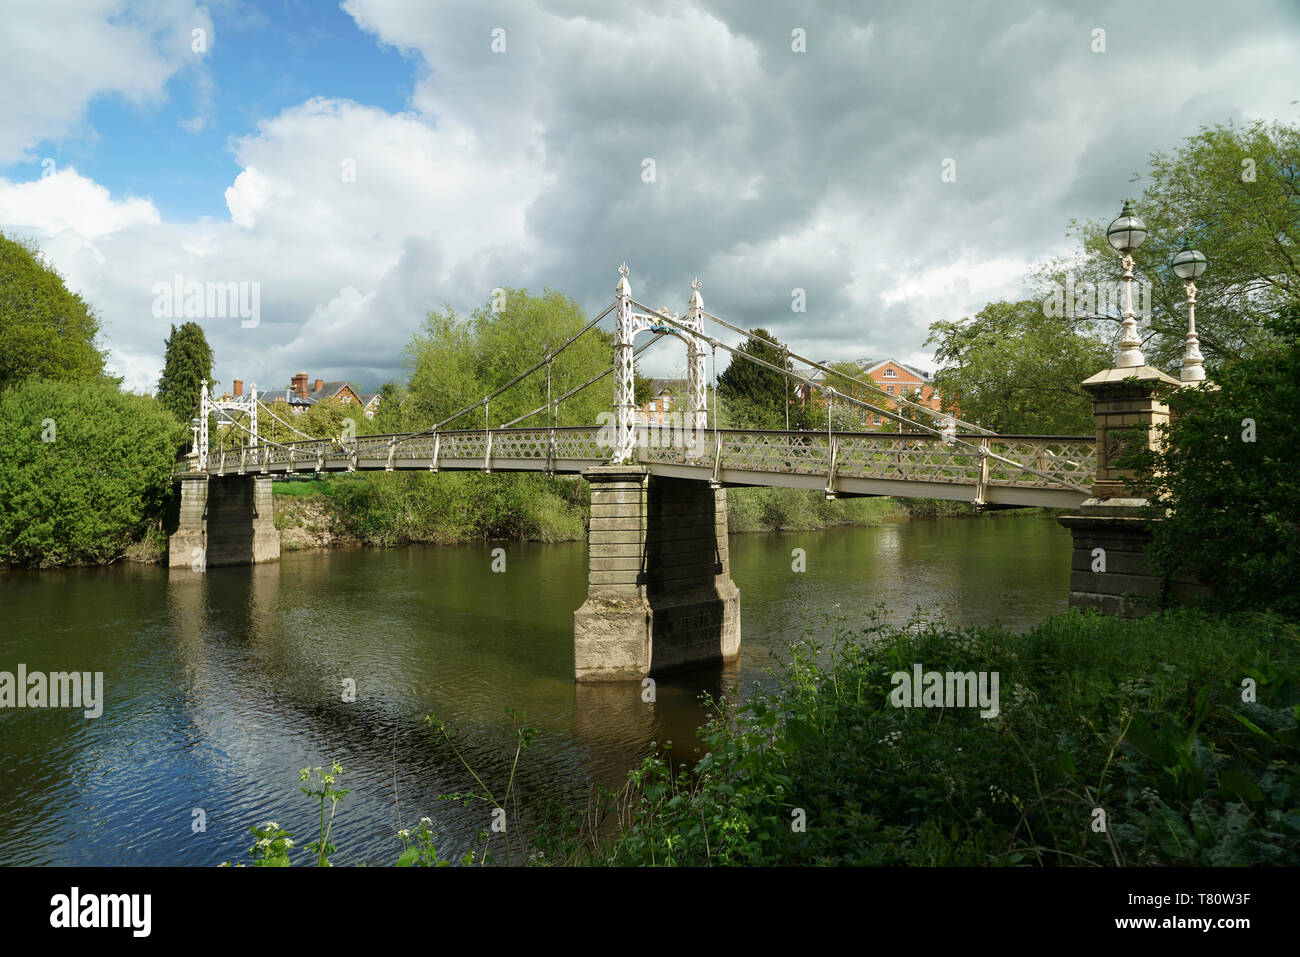 Wrought iron suspension bridge built in 1898 to celebrate Queen Victoria's Diamond Jubilee, listed Grade II - Stock Image